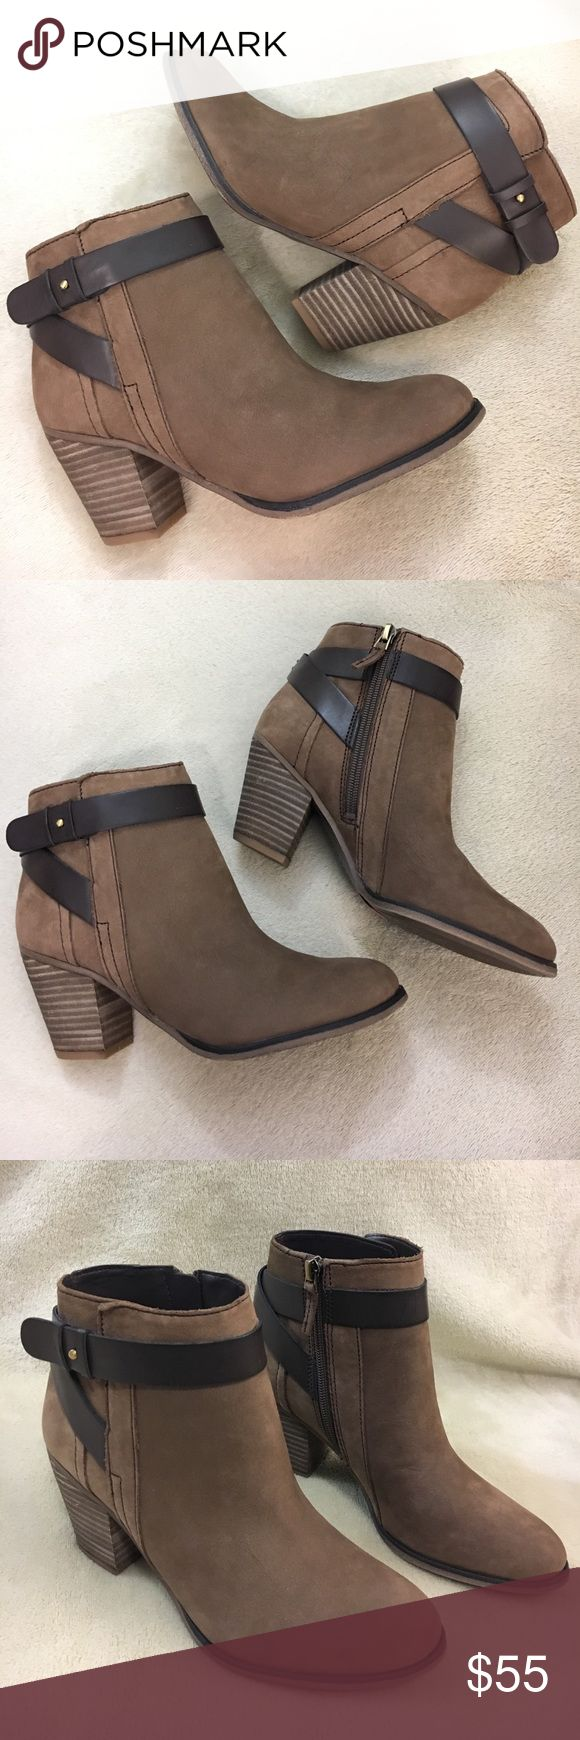 🆕 Franco Sarto Booties NEW Franco Sarto Leather Booties. Size 6. Franco Sarto Shoes Ankle Boots & Booties